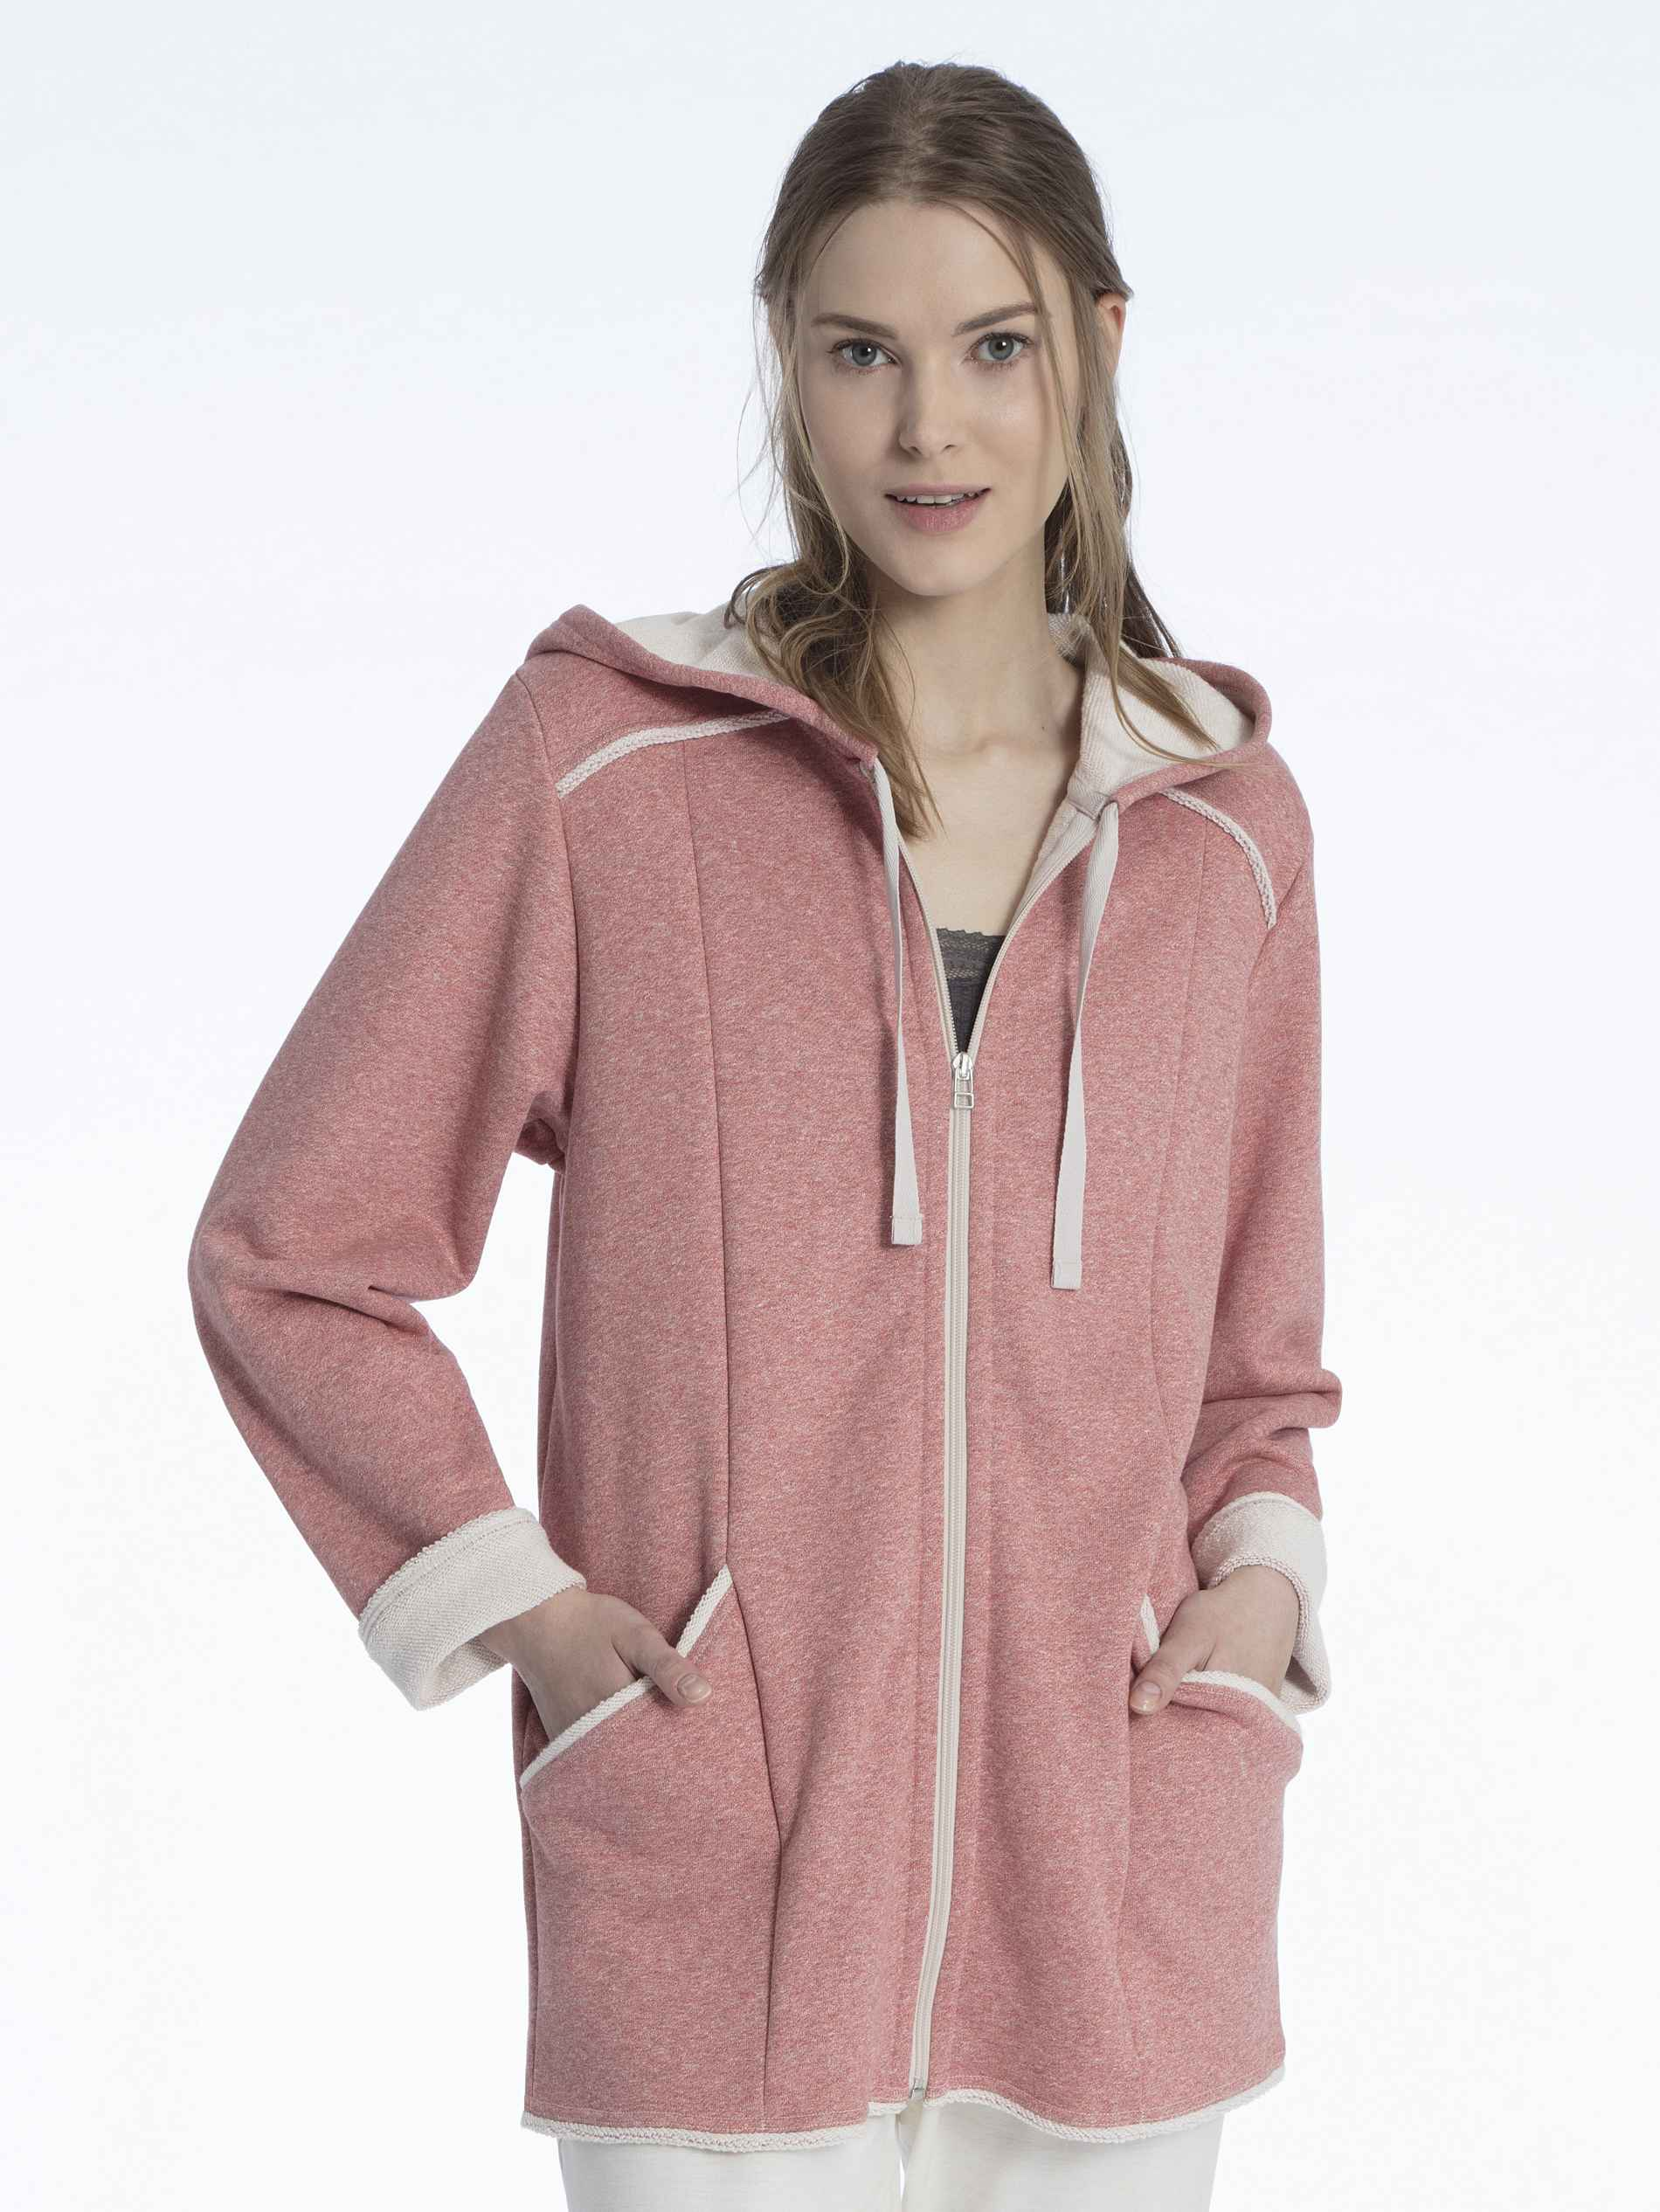 Damen CALIDA Favourites Trend 5 Fleece Kapuzen-Jacke mit Reißverschluss rot | 07613381036884